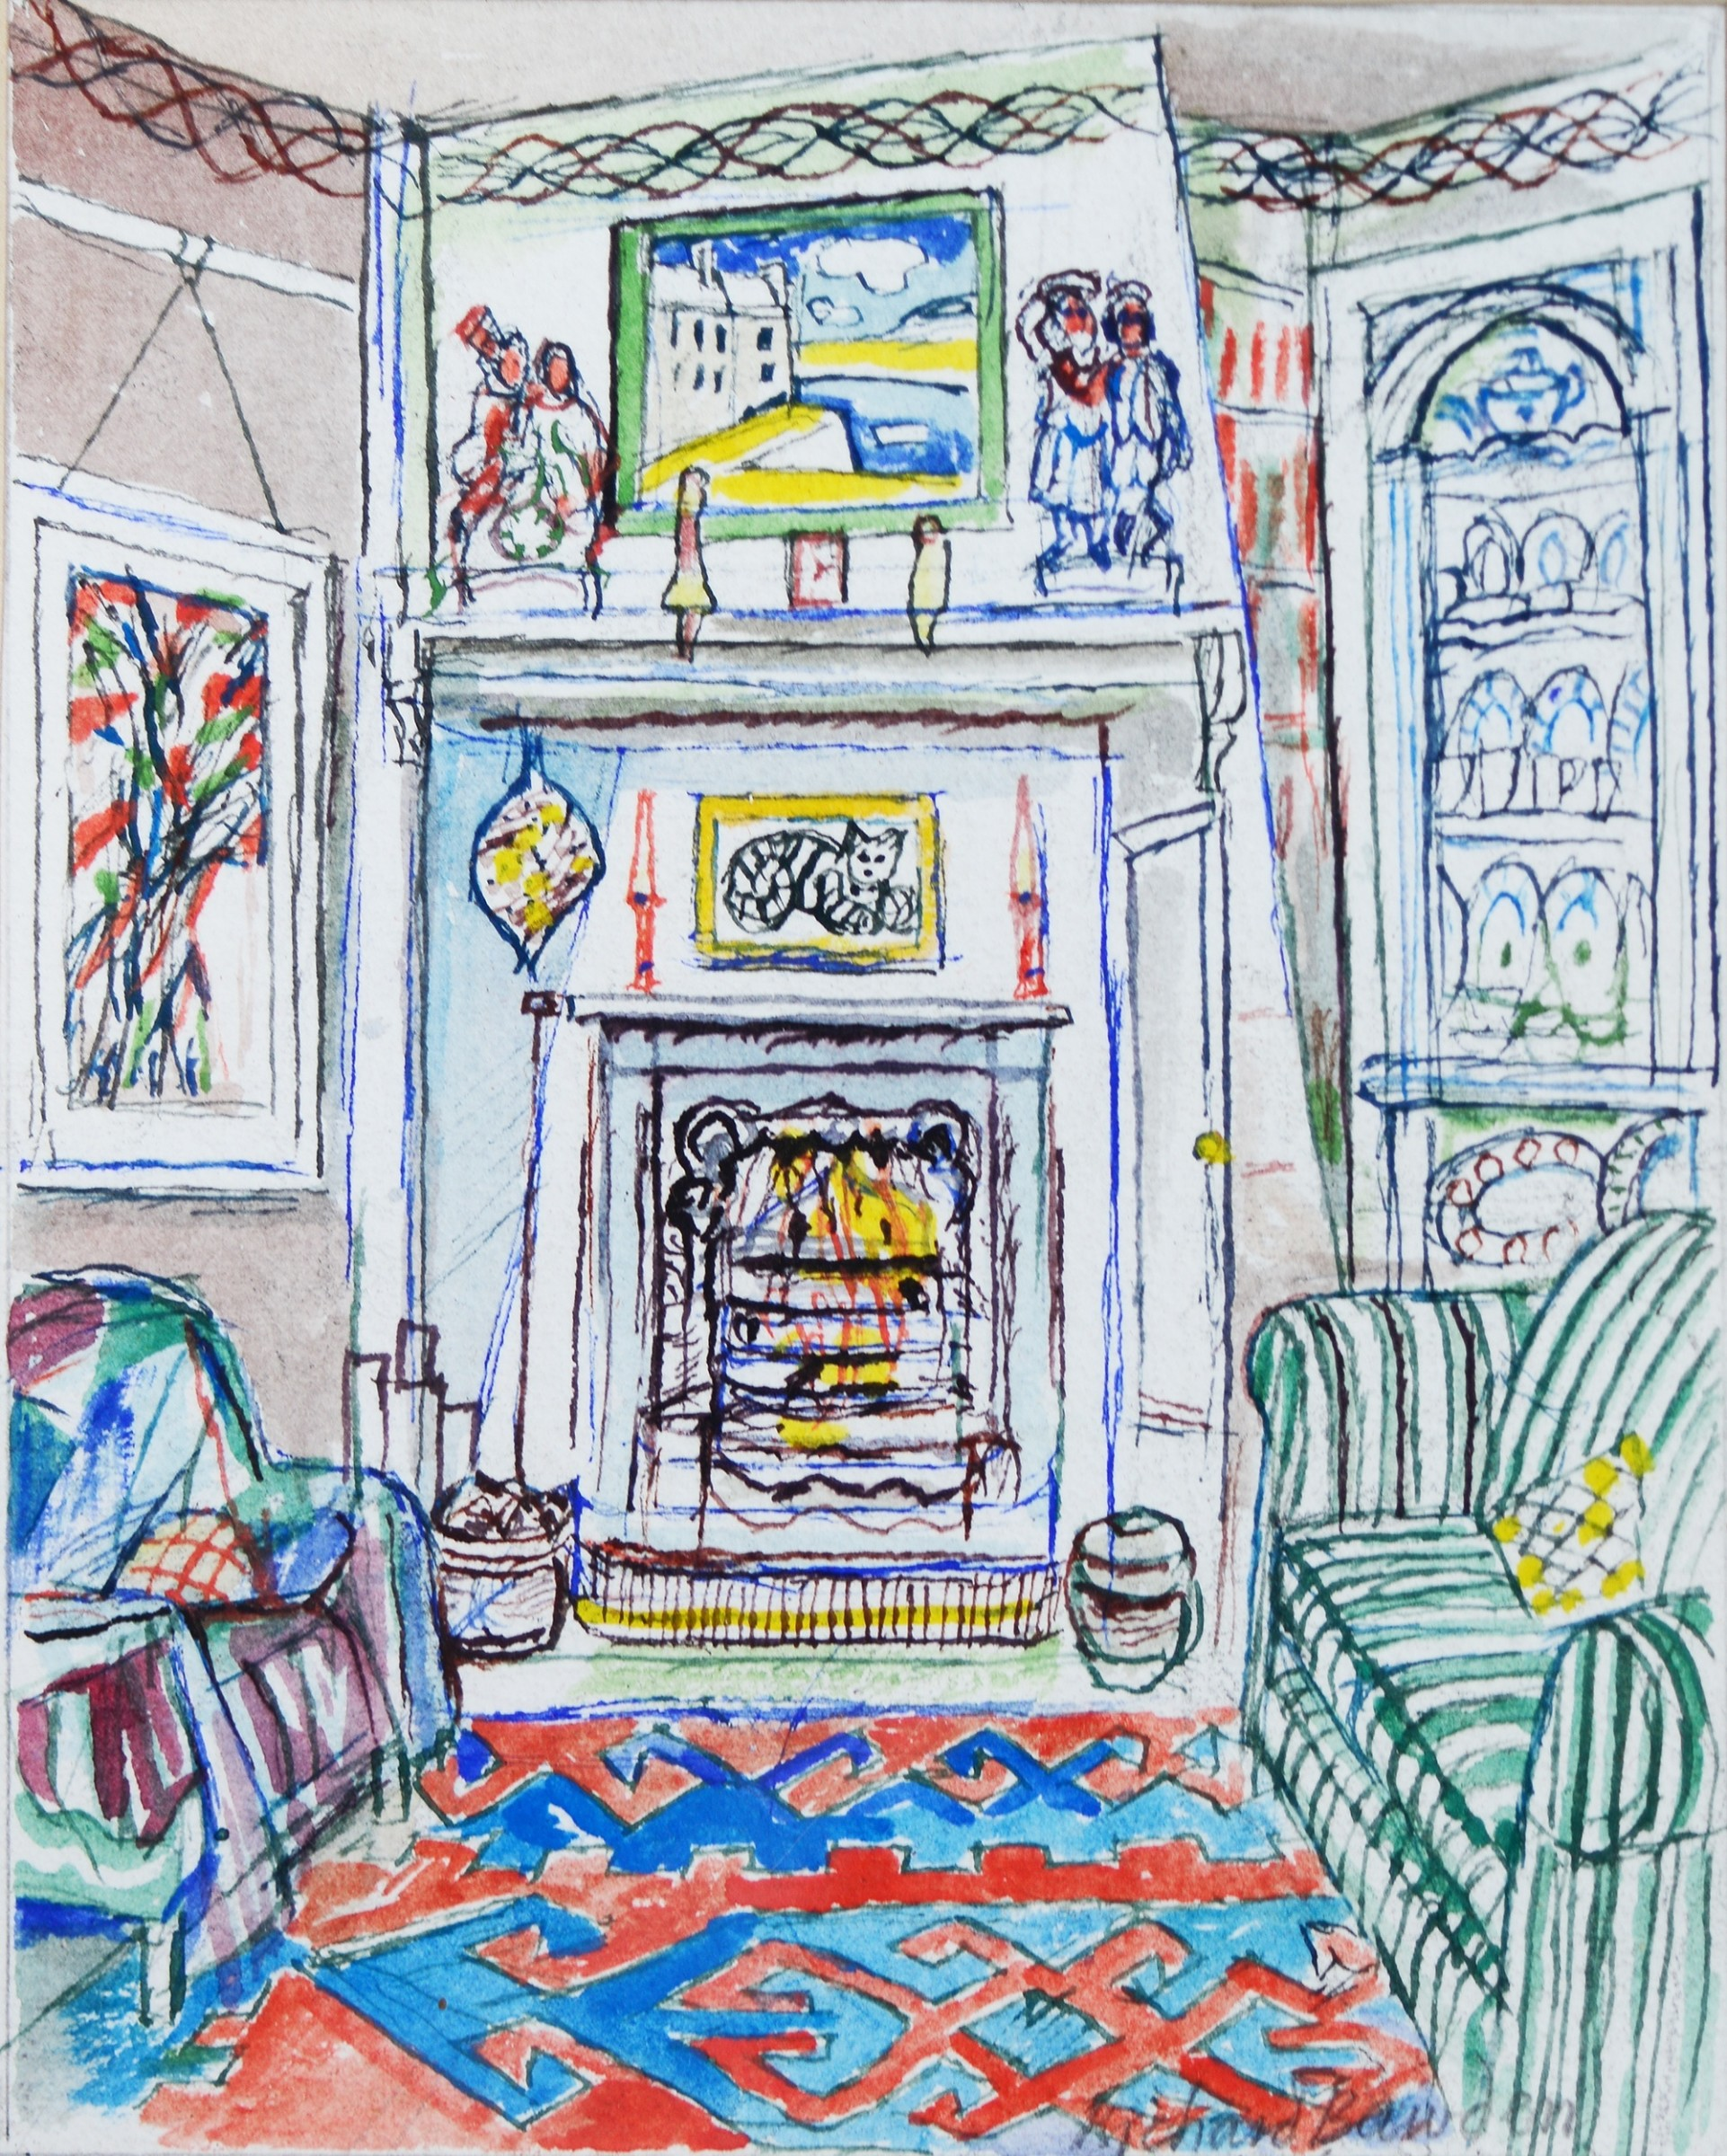 <span class=&#34;link fancybox-details-link&#34;><a href=&#34;/artists/38-richard-bawden/works/10575-richard-bawden-hot-fire/&#34;>View Detail Page</a></span><div class=&#34;artist&#34;><span class=&#34;artist&#34;><strong>Richard Bawden</strong></span></div><div class=&#34;title&#34;><em>Hot Fire</em></div><div class=&#34;medium&#34;>watercolour</div><div class=&#34;dimensions&#34;>30x25cm</div><div class=&#34;price&#34;>£480.00</div>